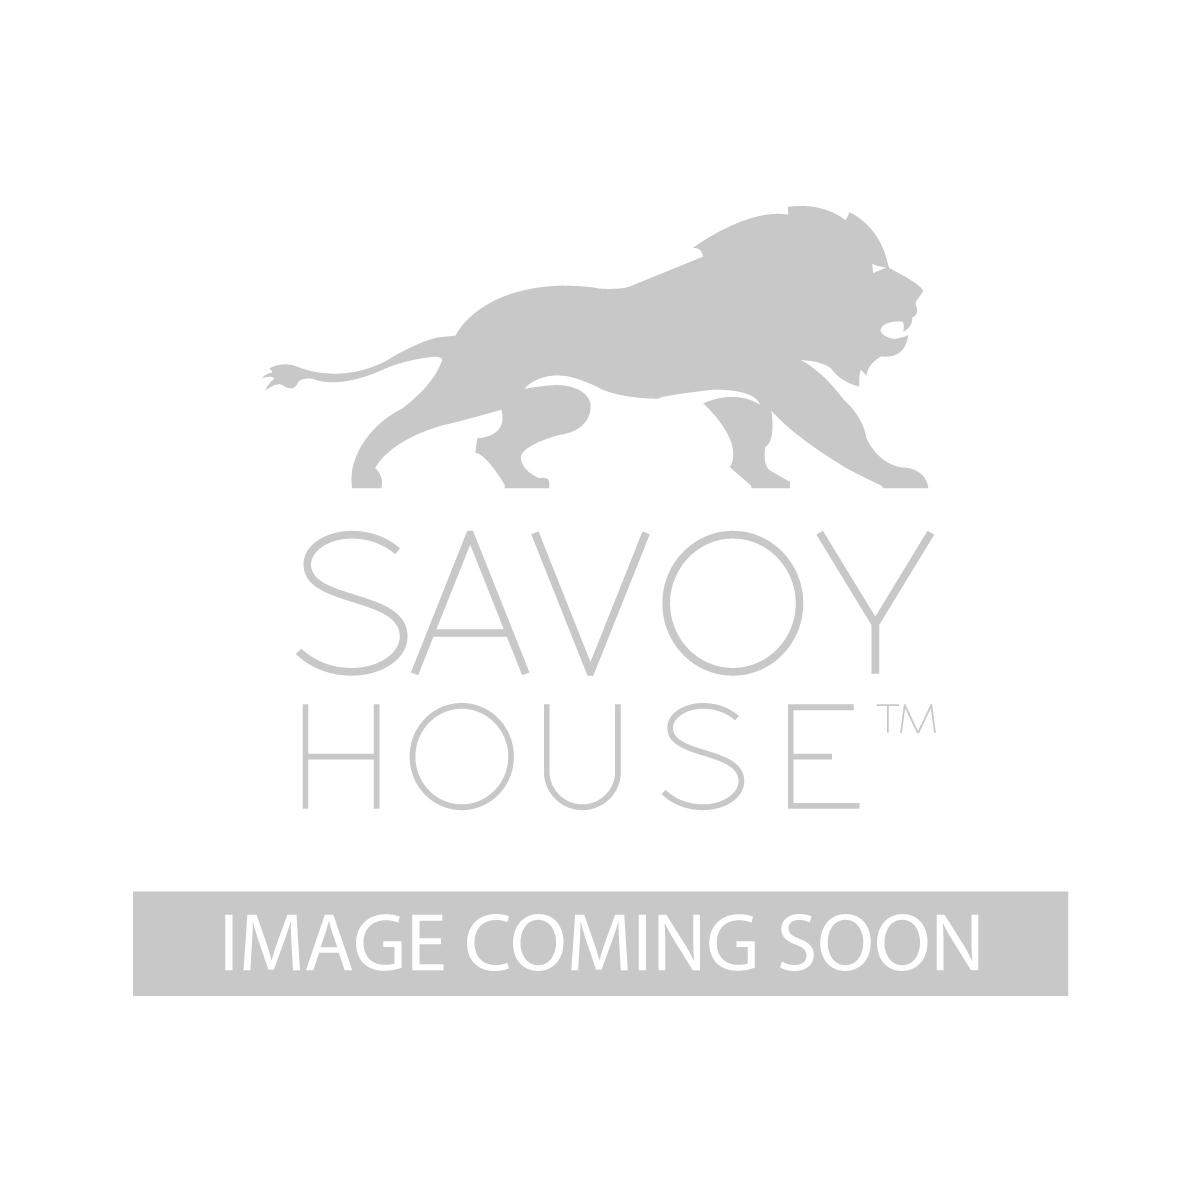 3 9074 8 79 Dunbar 8 Light Pendant By Savoy House